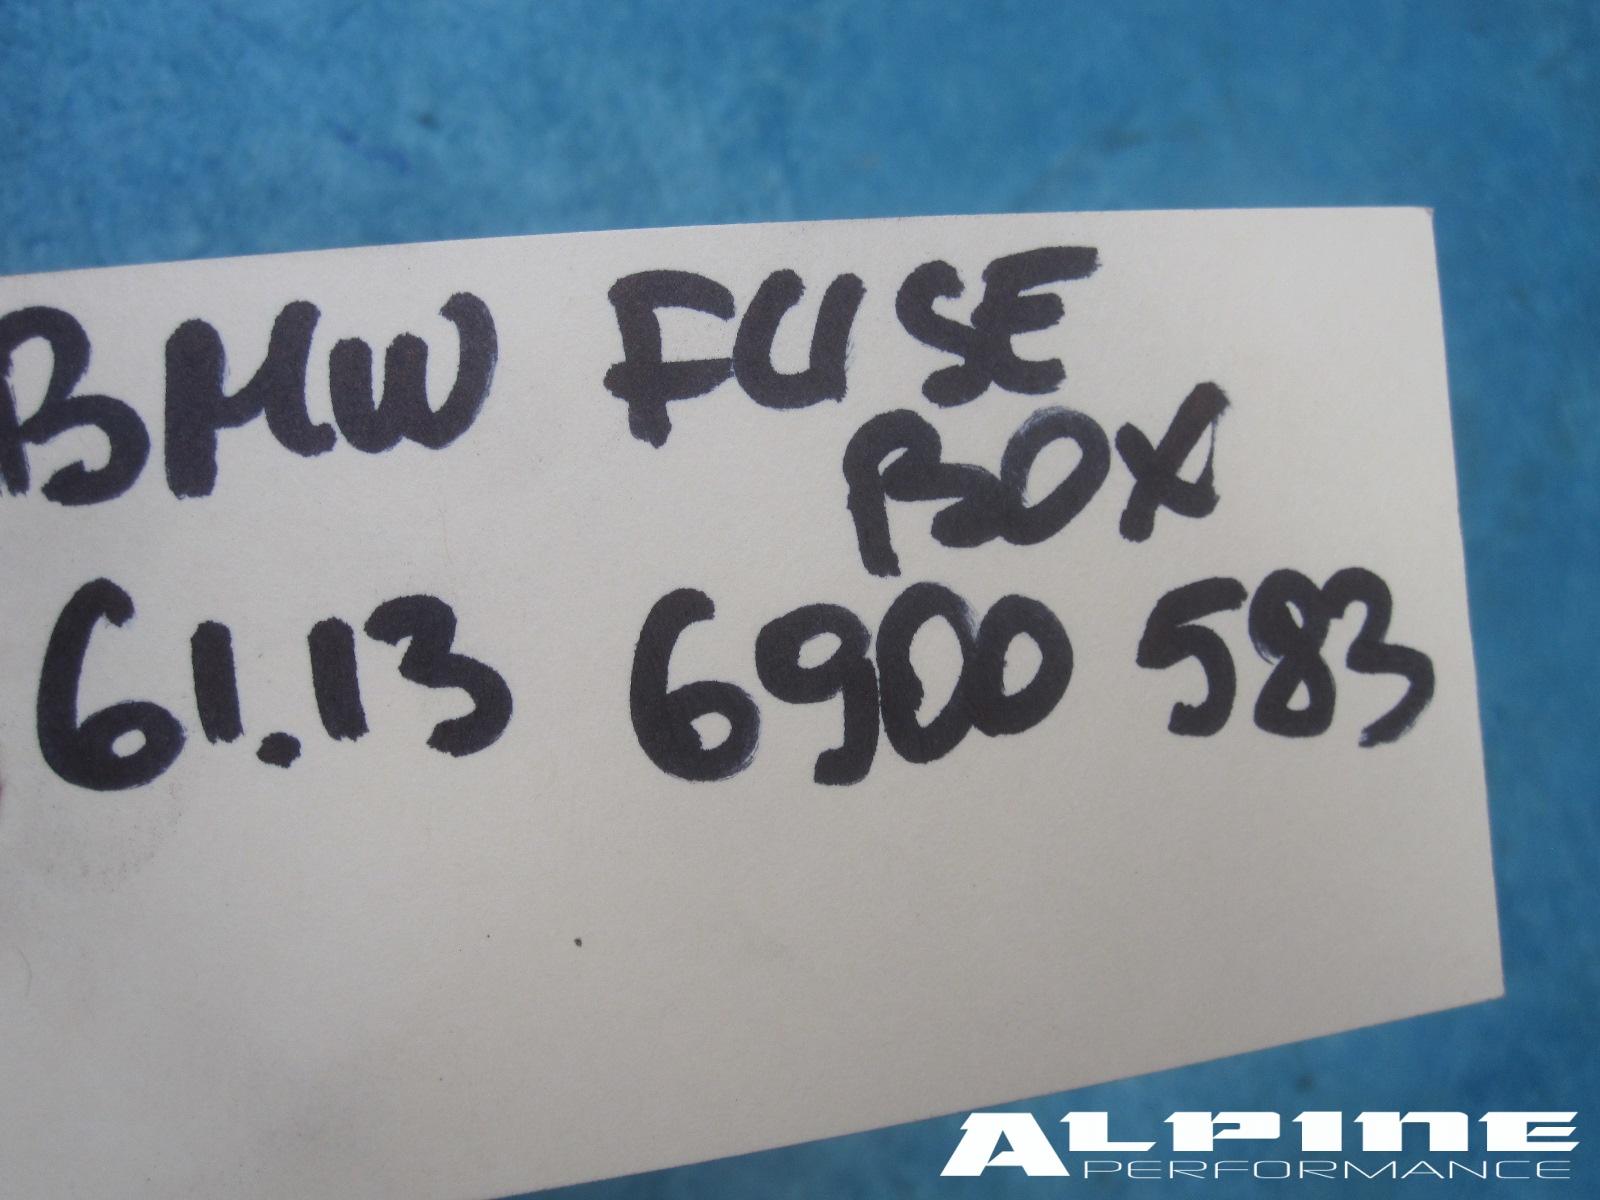 Origianal Bmw Power Distribution Fuse Box Trunk E65 E66 745i 750i B7 745li 750li 3500 1 In Stock